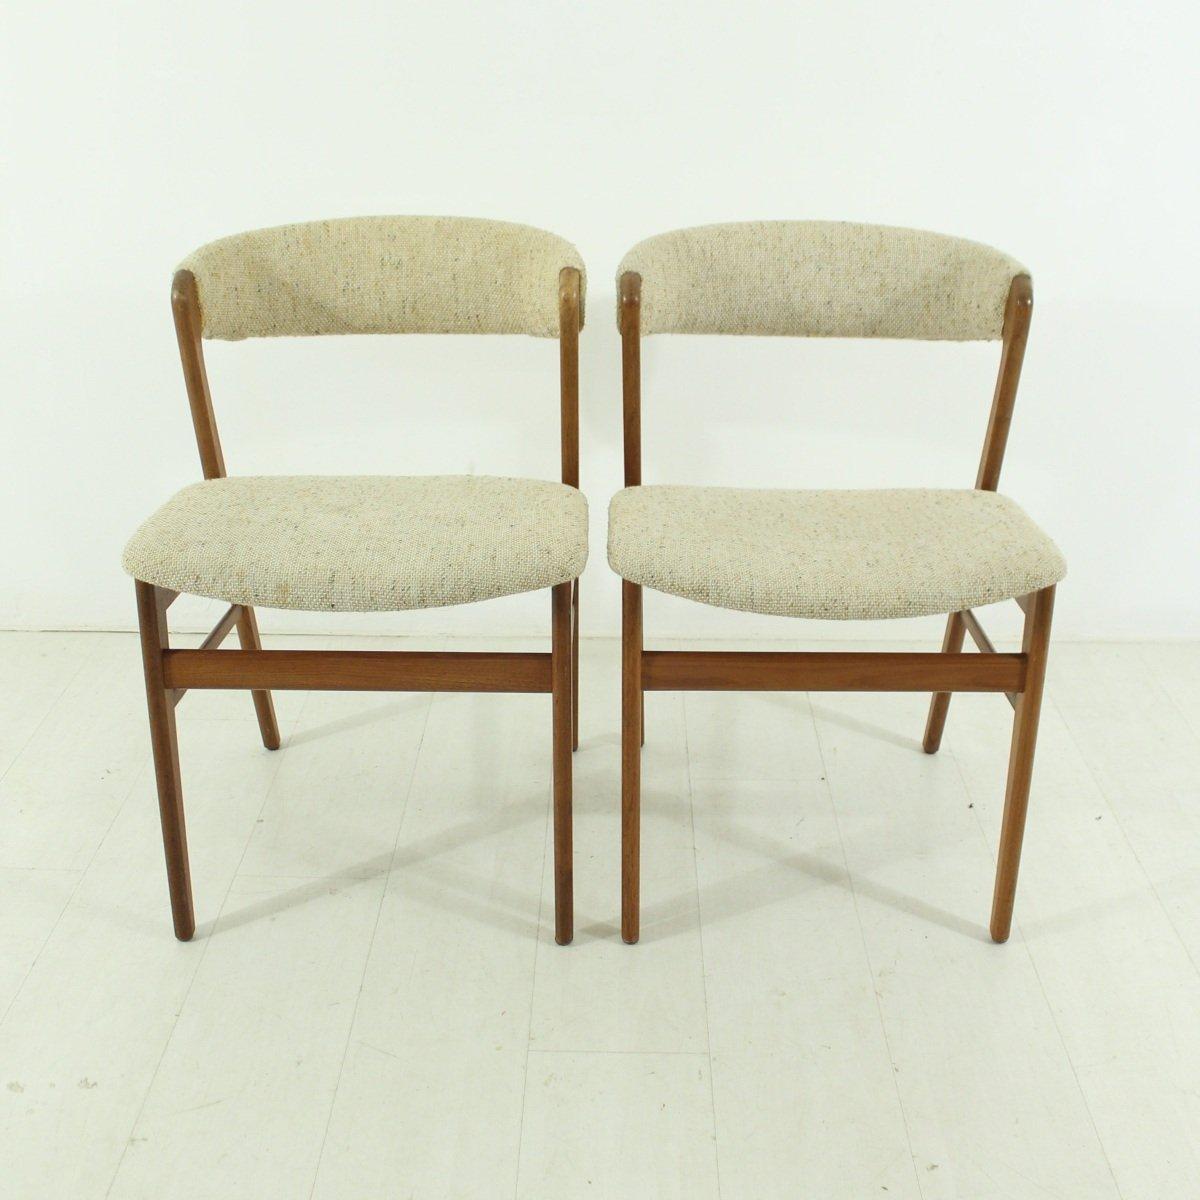 danish teak chairs 1960s set of 2 for sale at pamono